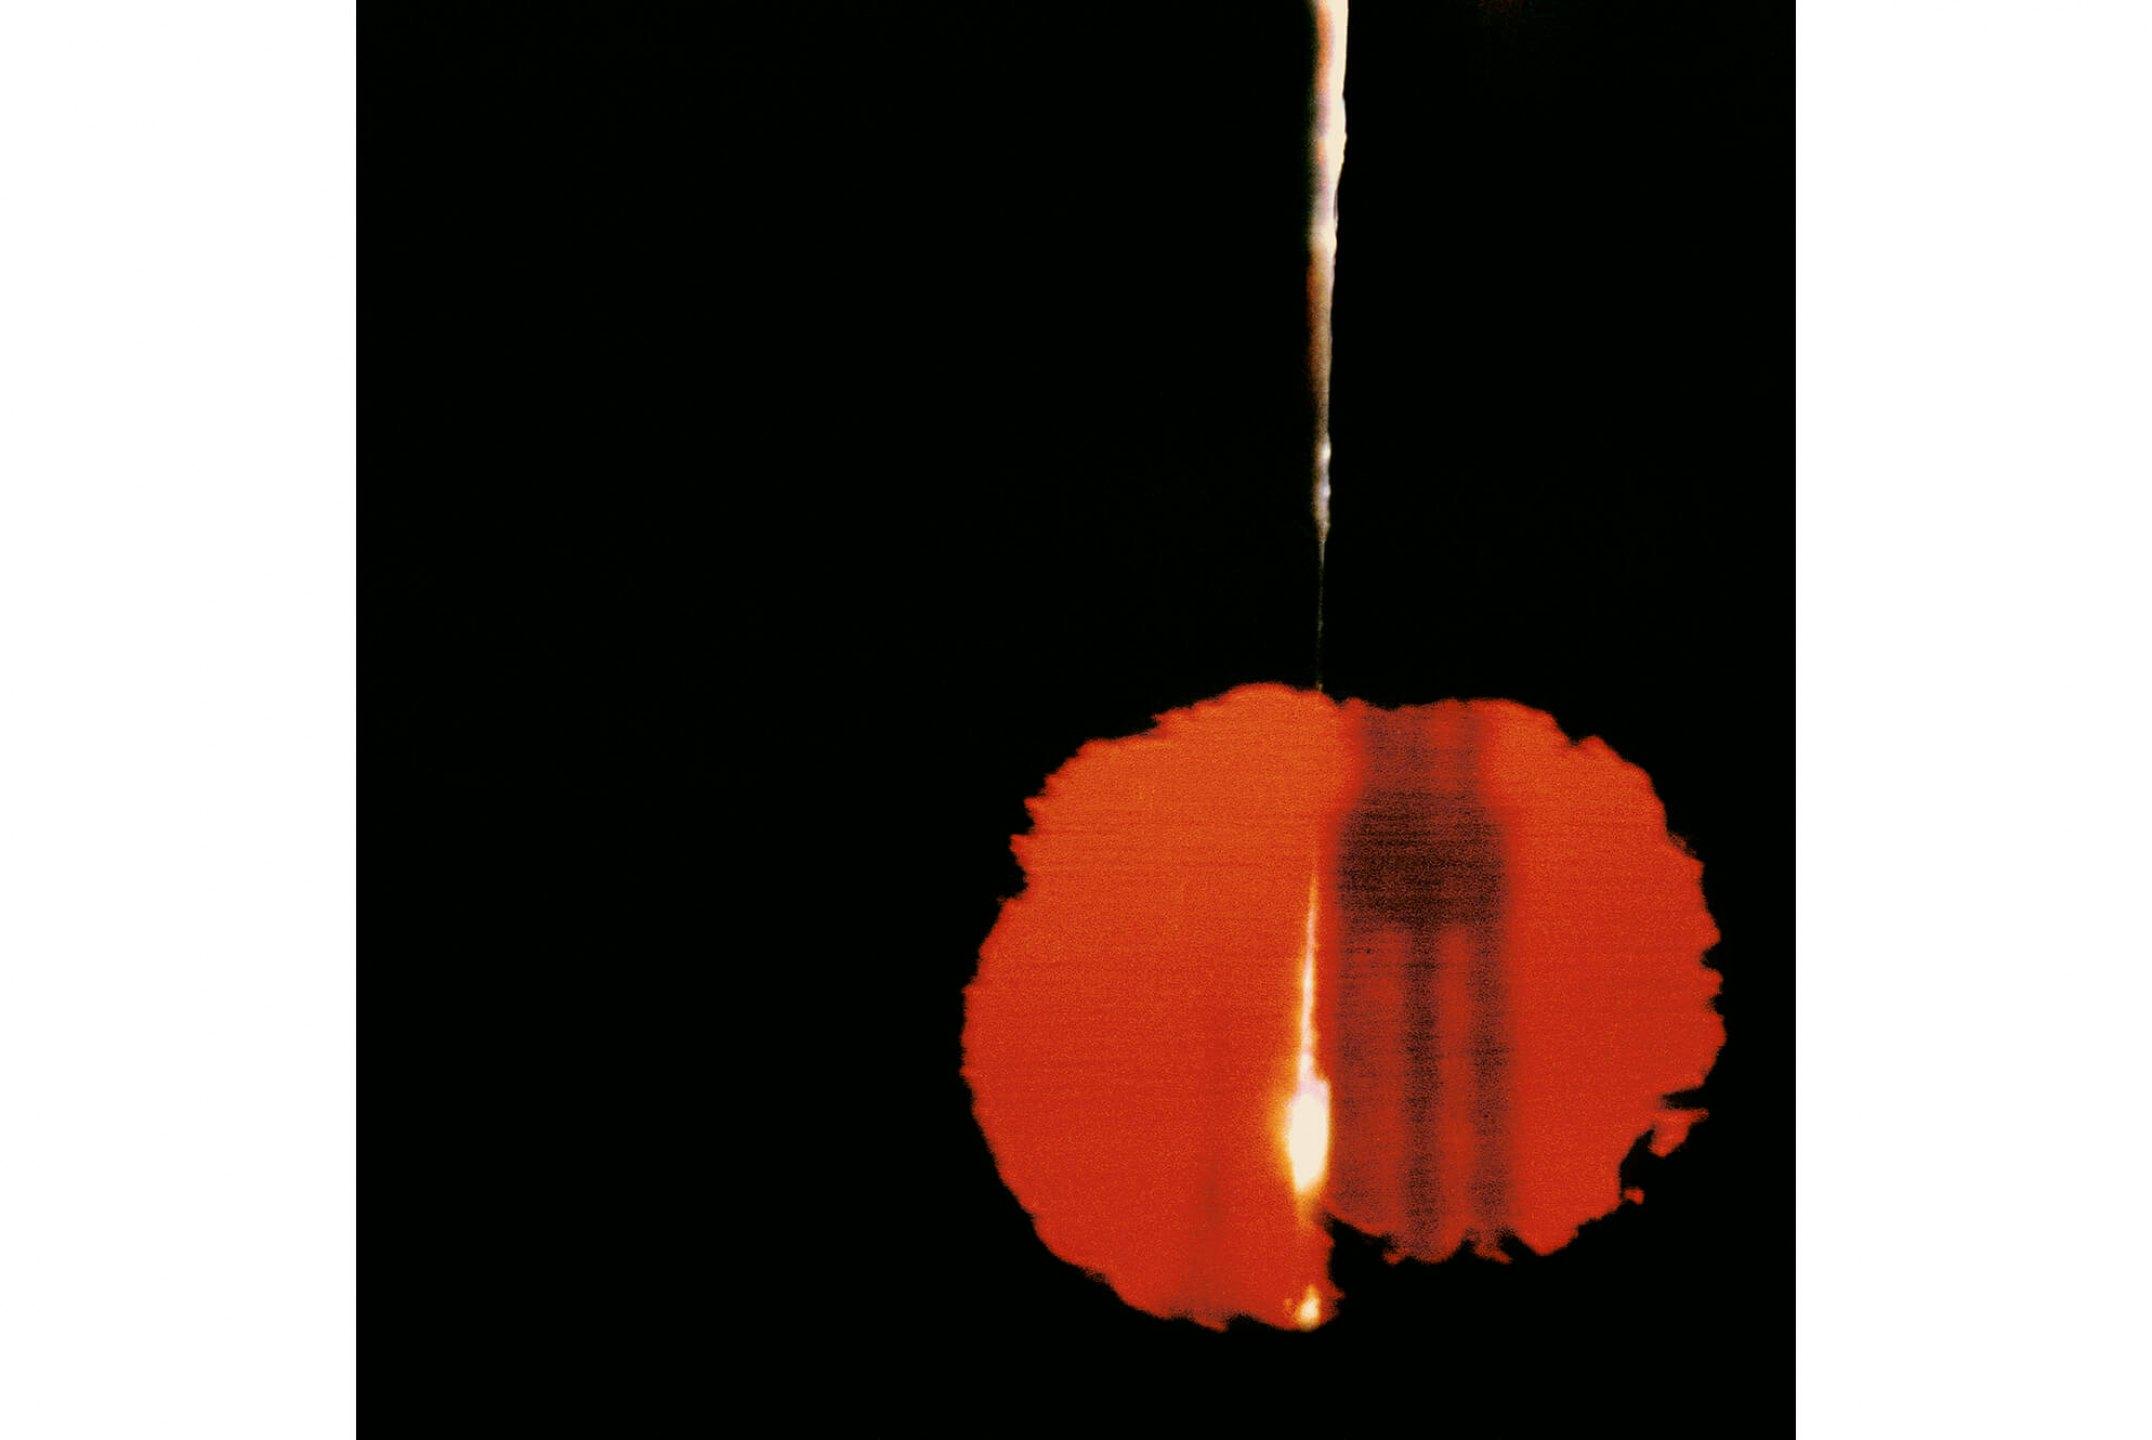 Leticia Ramos,<em>Instantâneo Sequencial IV</em>, 2009, photograph 35mm on coton paper, 100 × 100cm - Mendes Wood DM